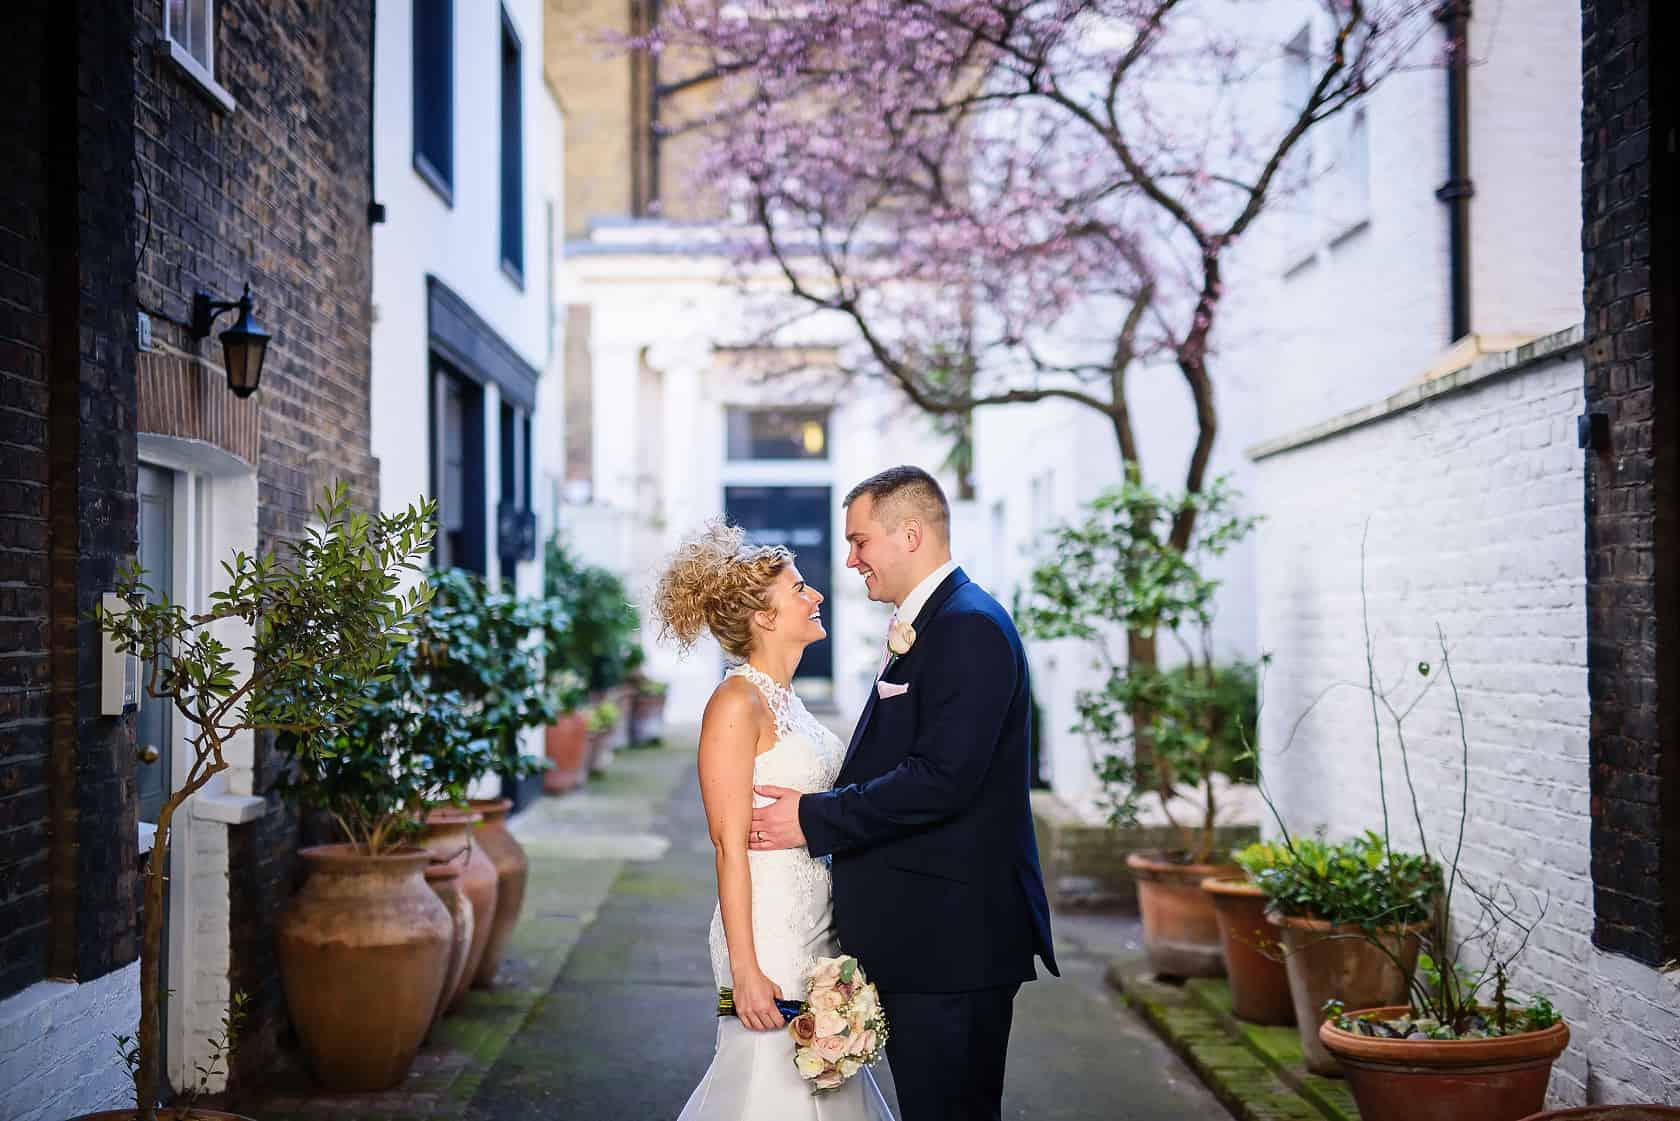 Best_Wedding_Photography_2018_Wedding-Photographer-Essex-and-London_031